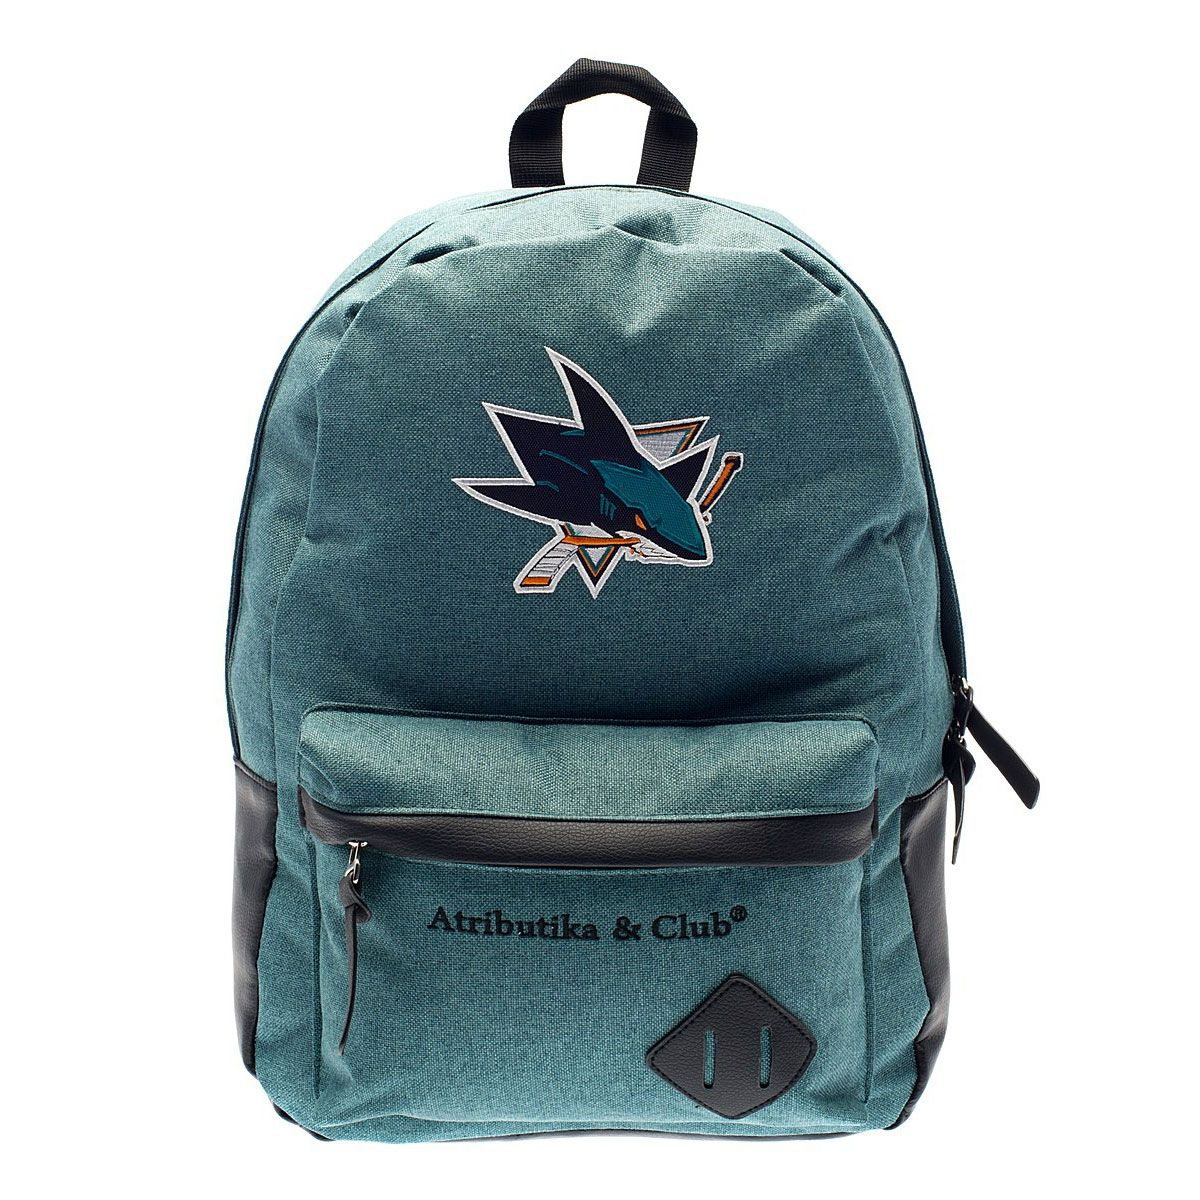 СУМКА-РЮКЗАК ATRIBUTIKA & CLUB NHL SR 58059-58061